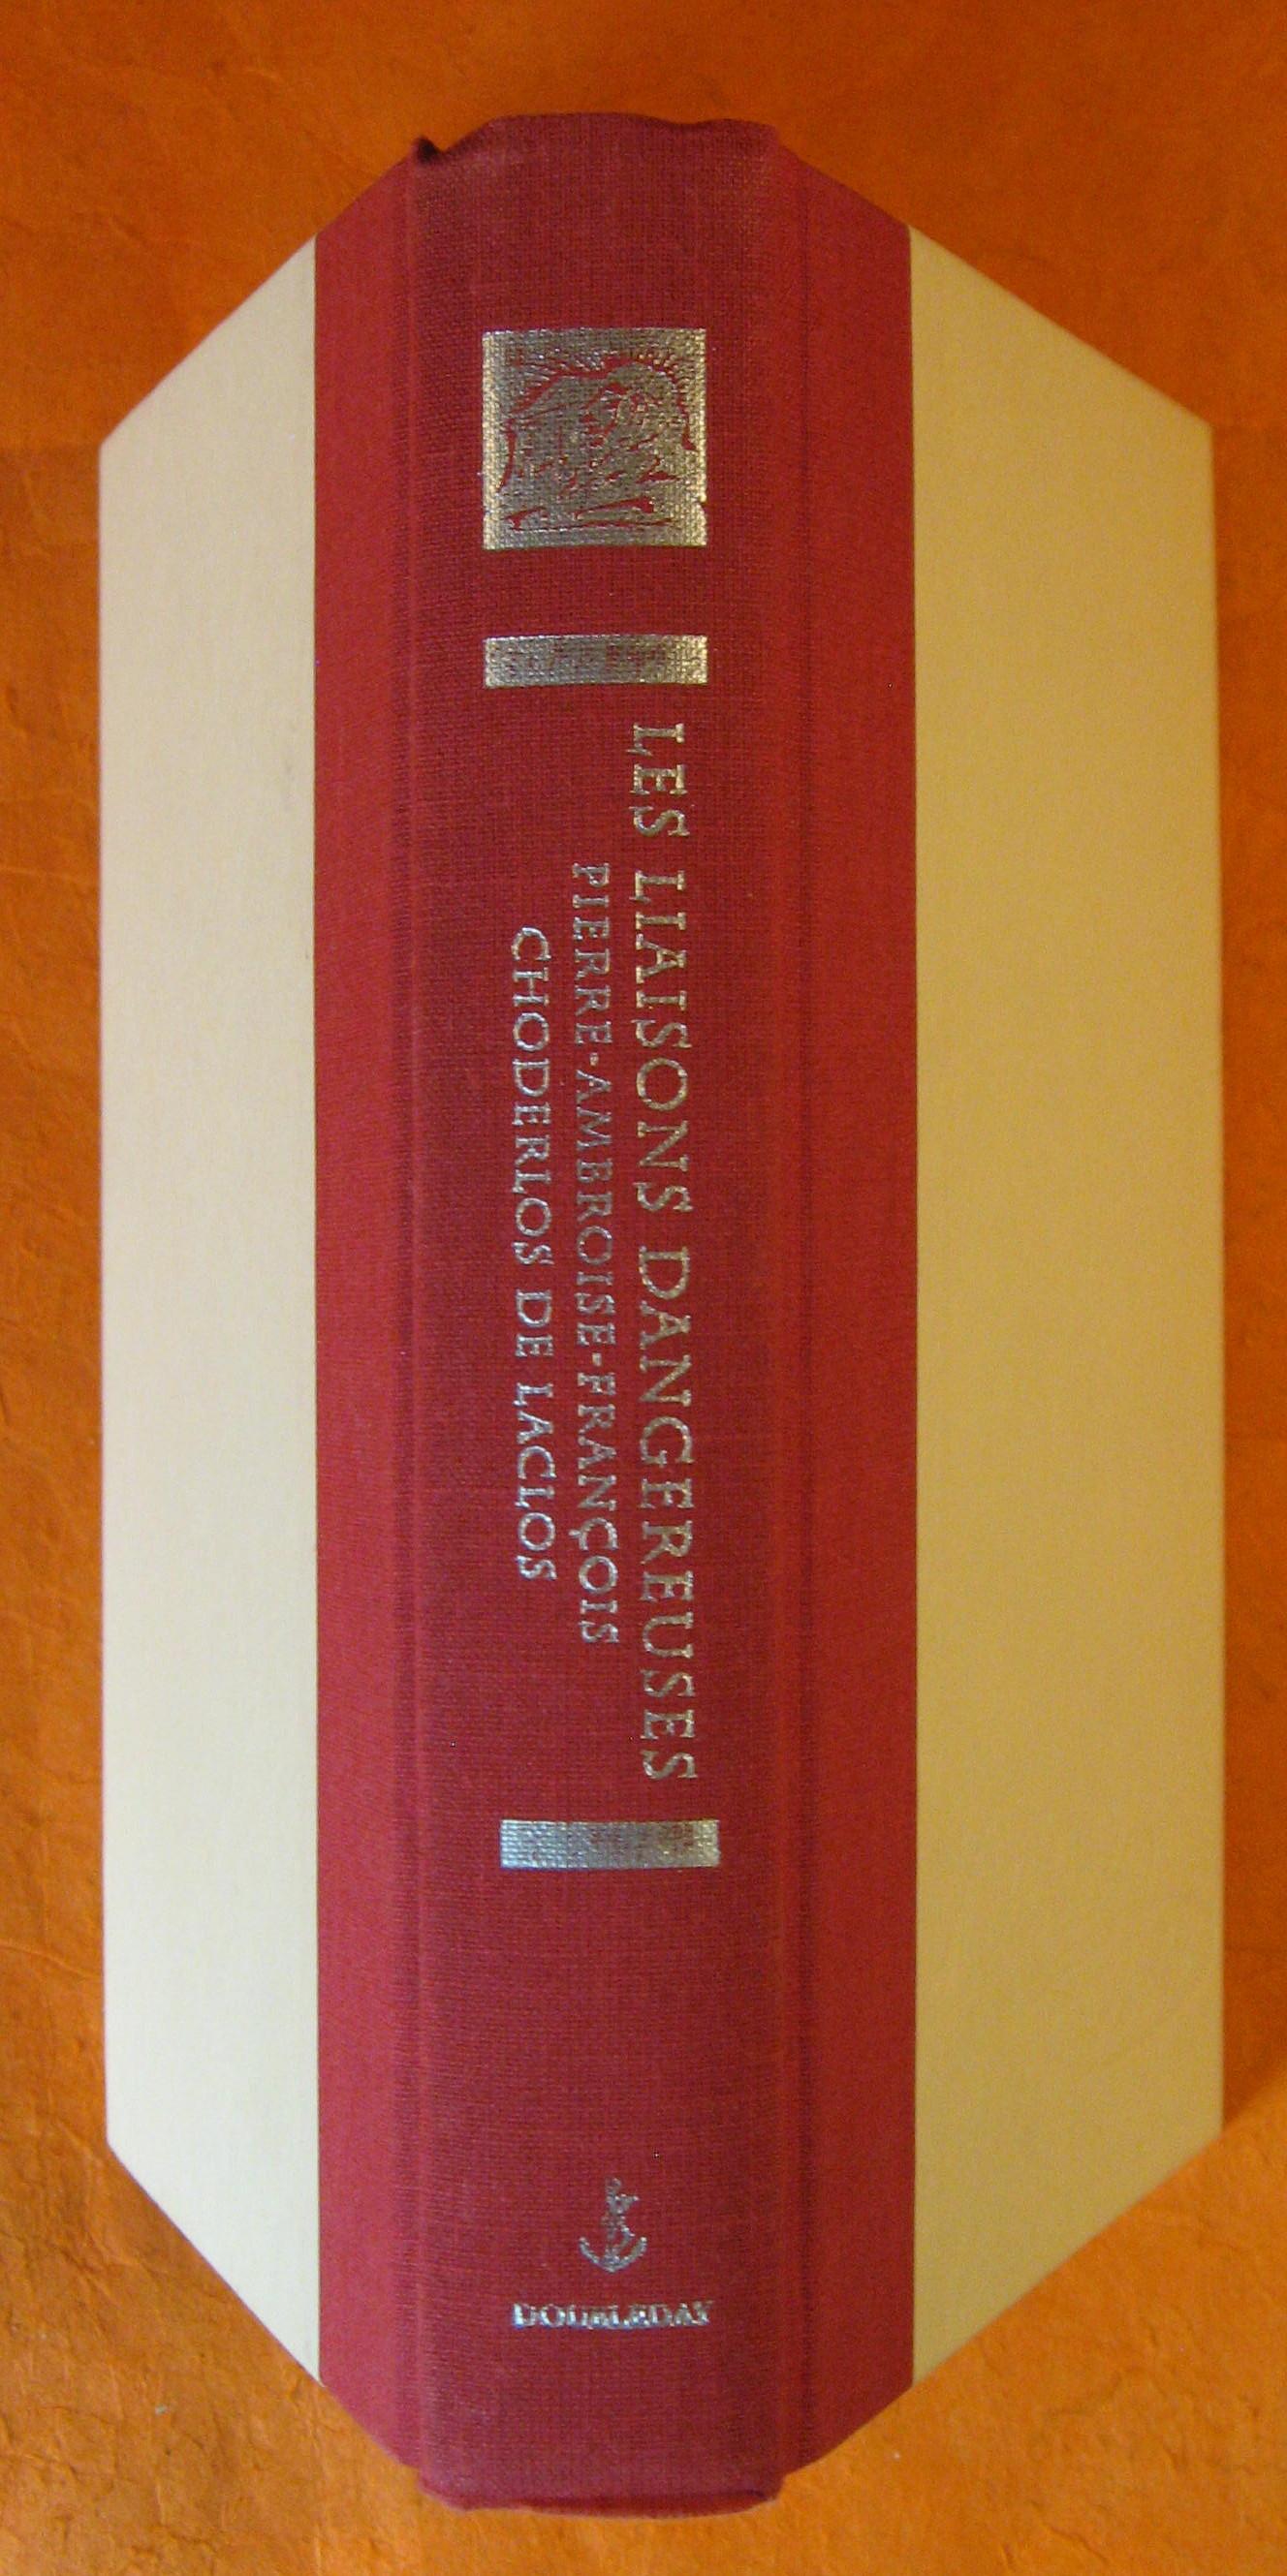 Les Liaisons Dangereuses (New York Public Library Collector's Edition)